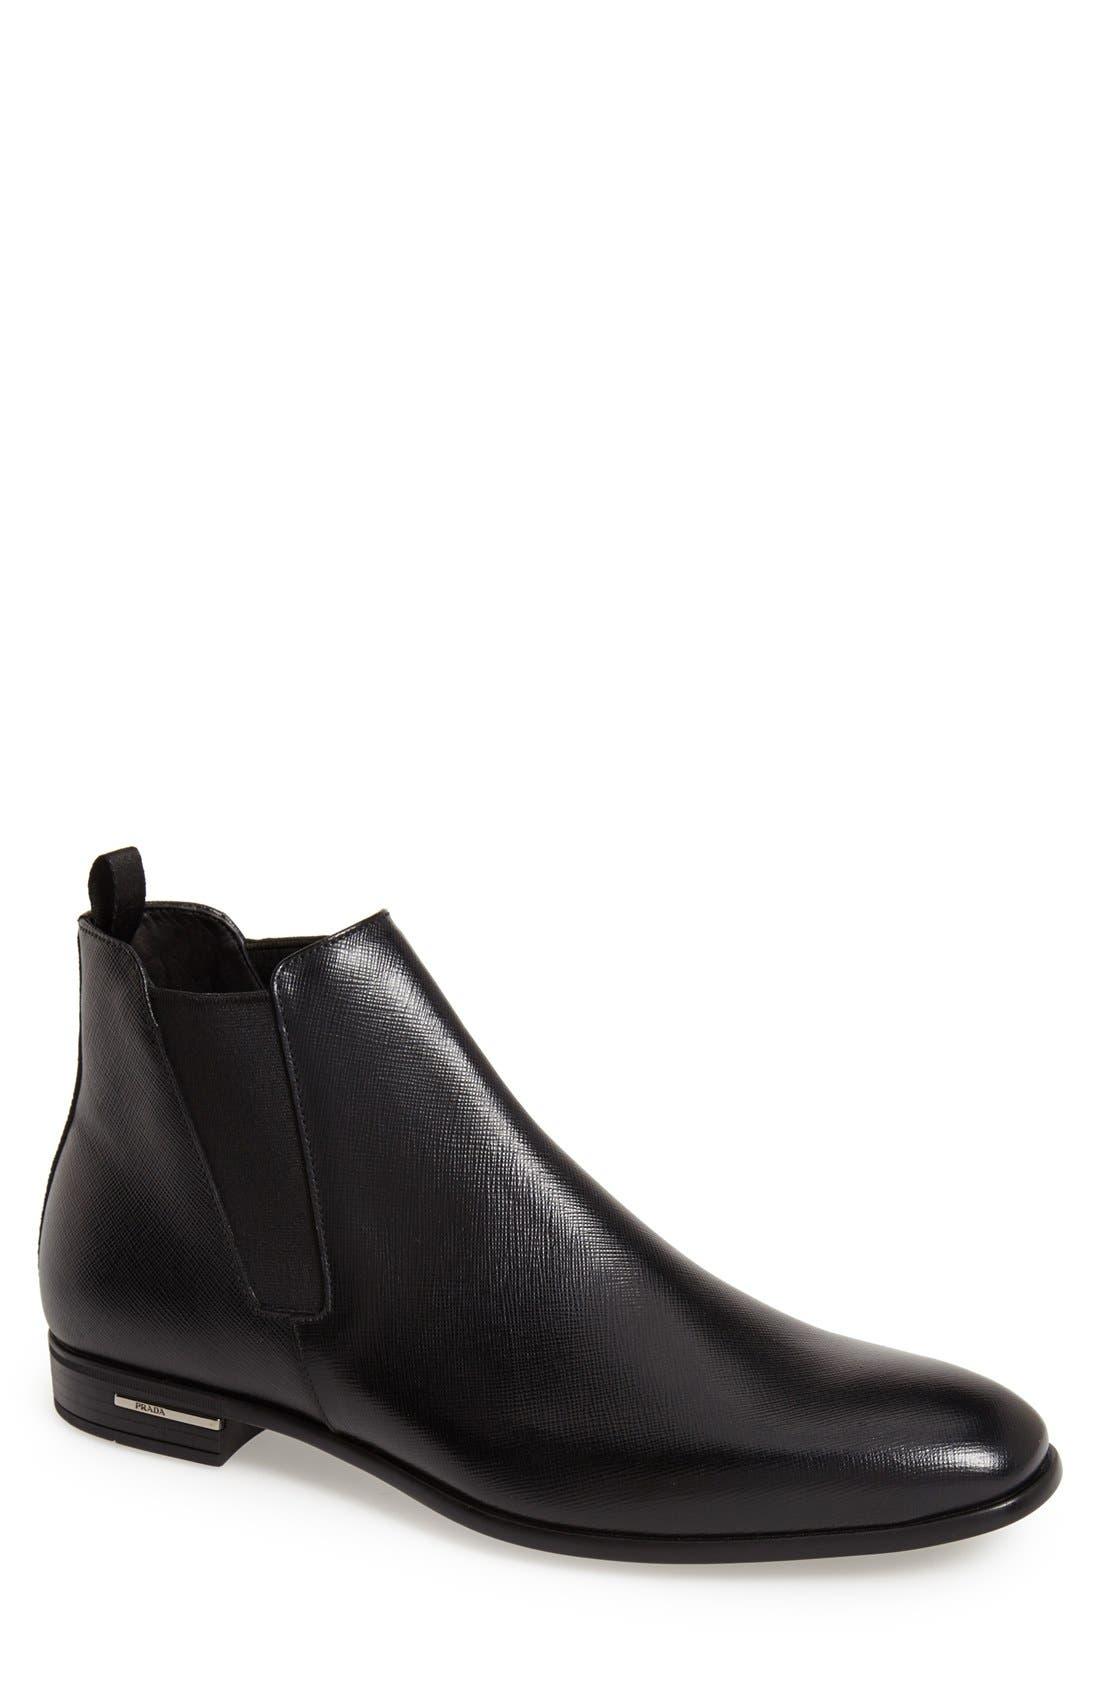 PRADA Saffiano Leather Chelsea Boot, Main, color, BLACK